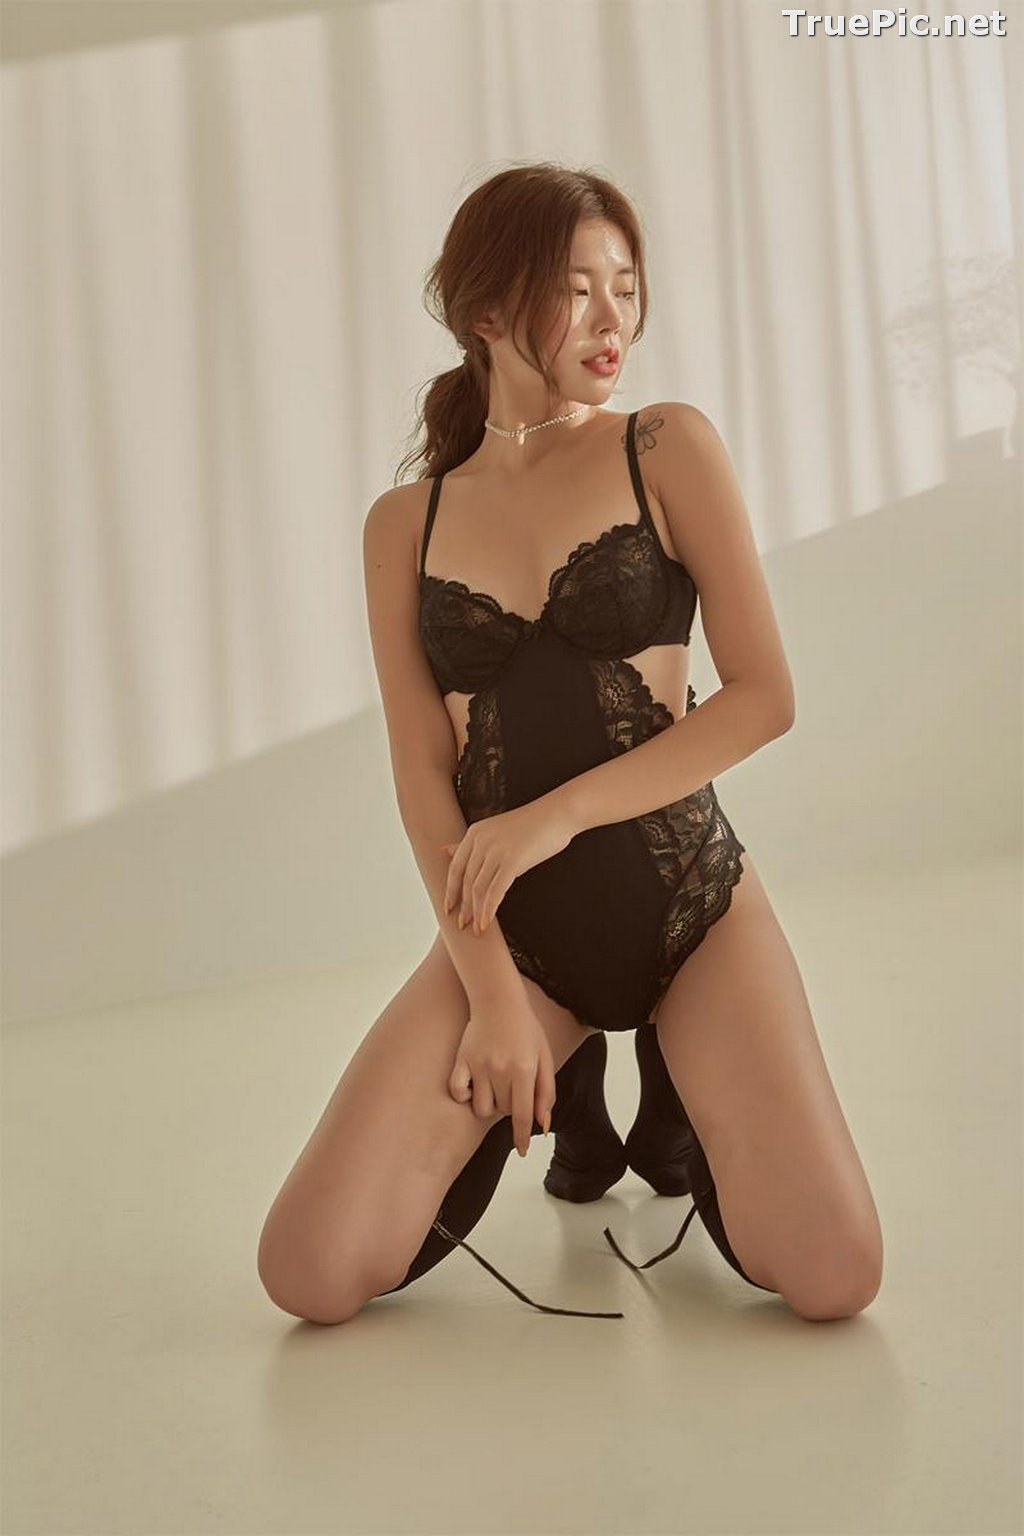 Image Korean Fashion Model - Da Yomi (다요미) - Lountess Spring Lingerie #1 - TruePic.net - Picture-8